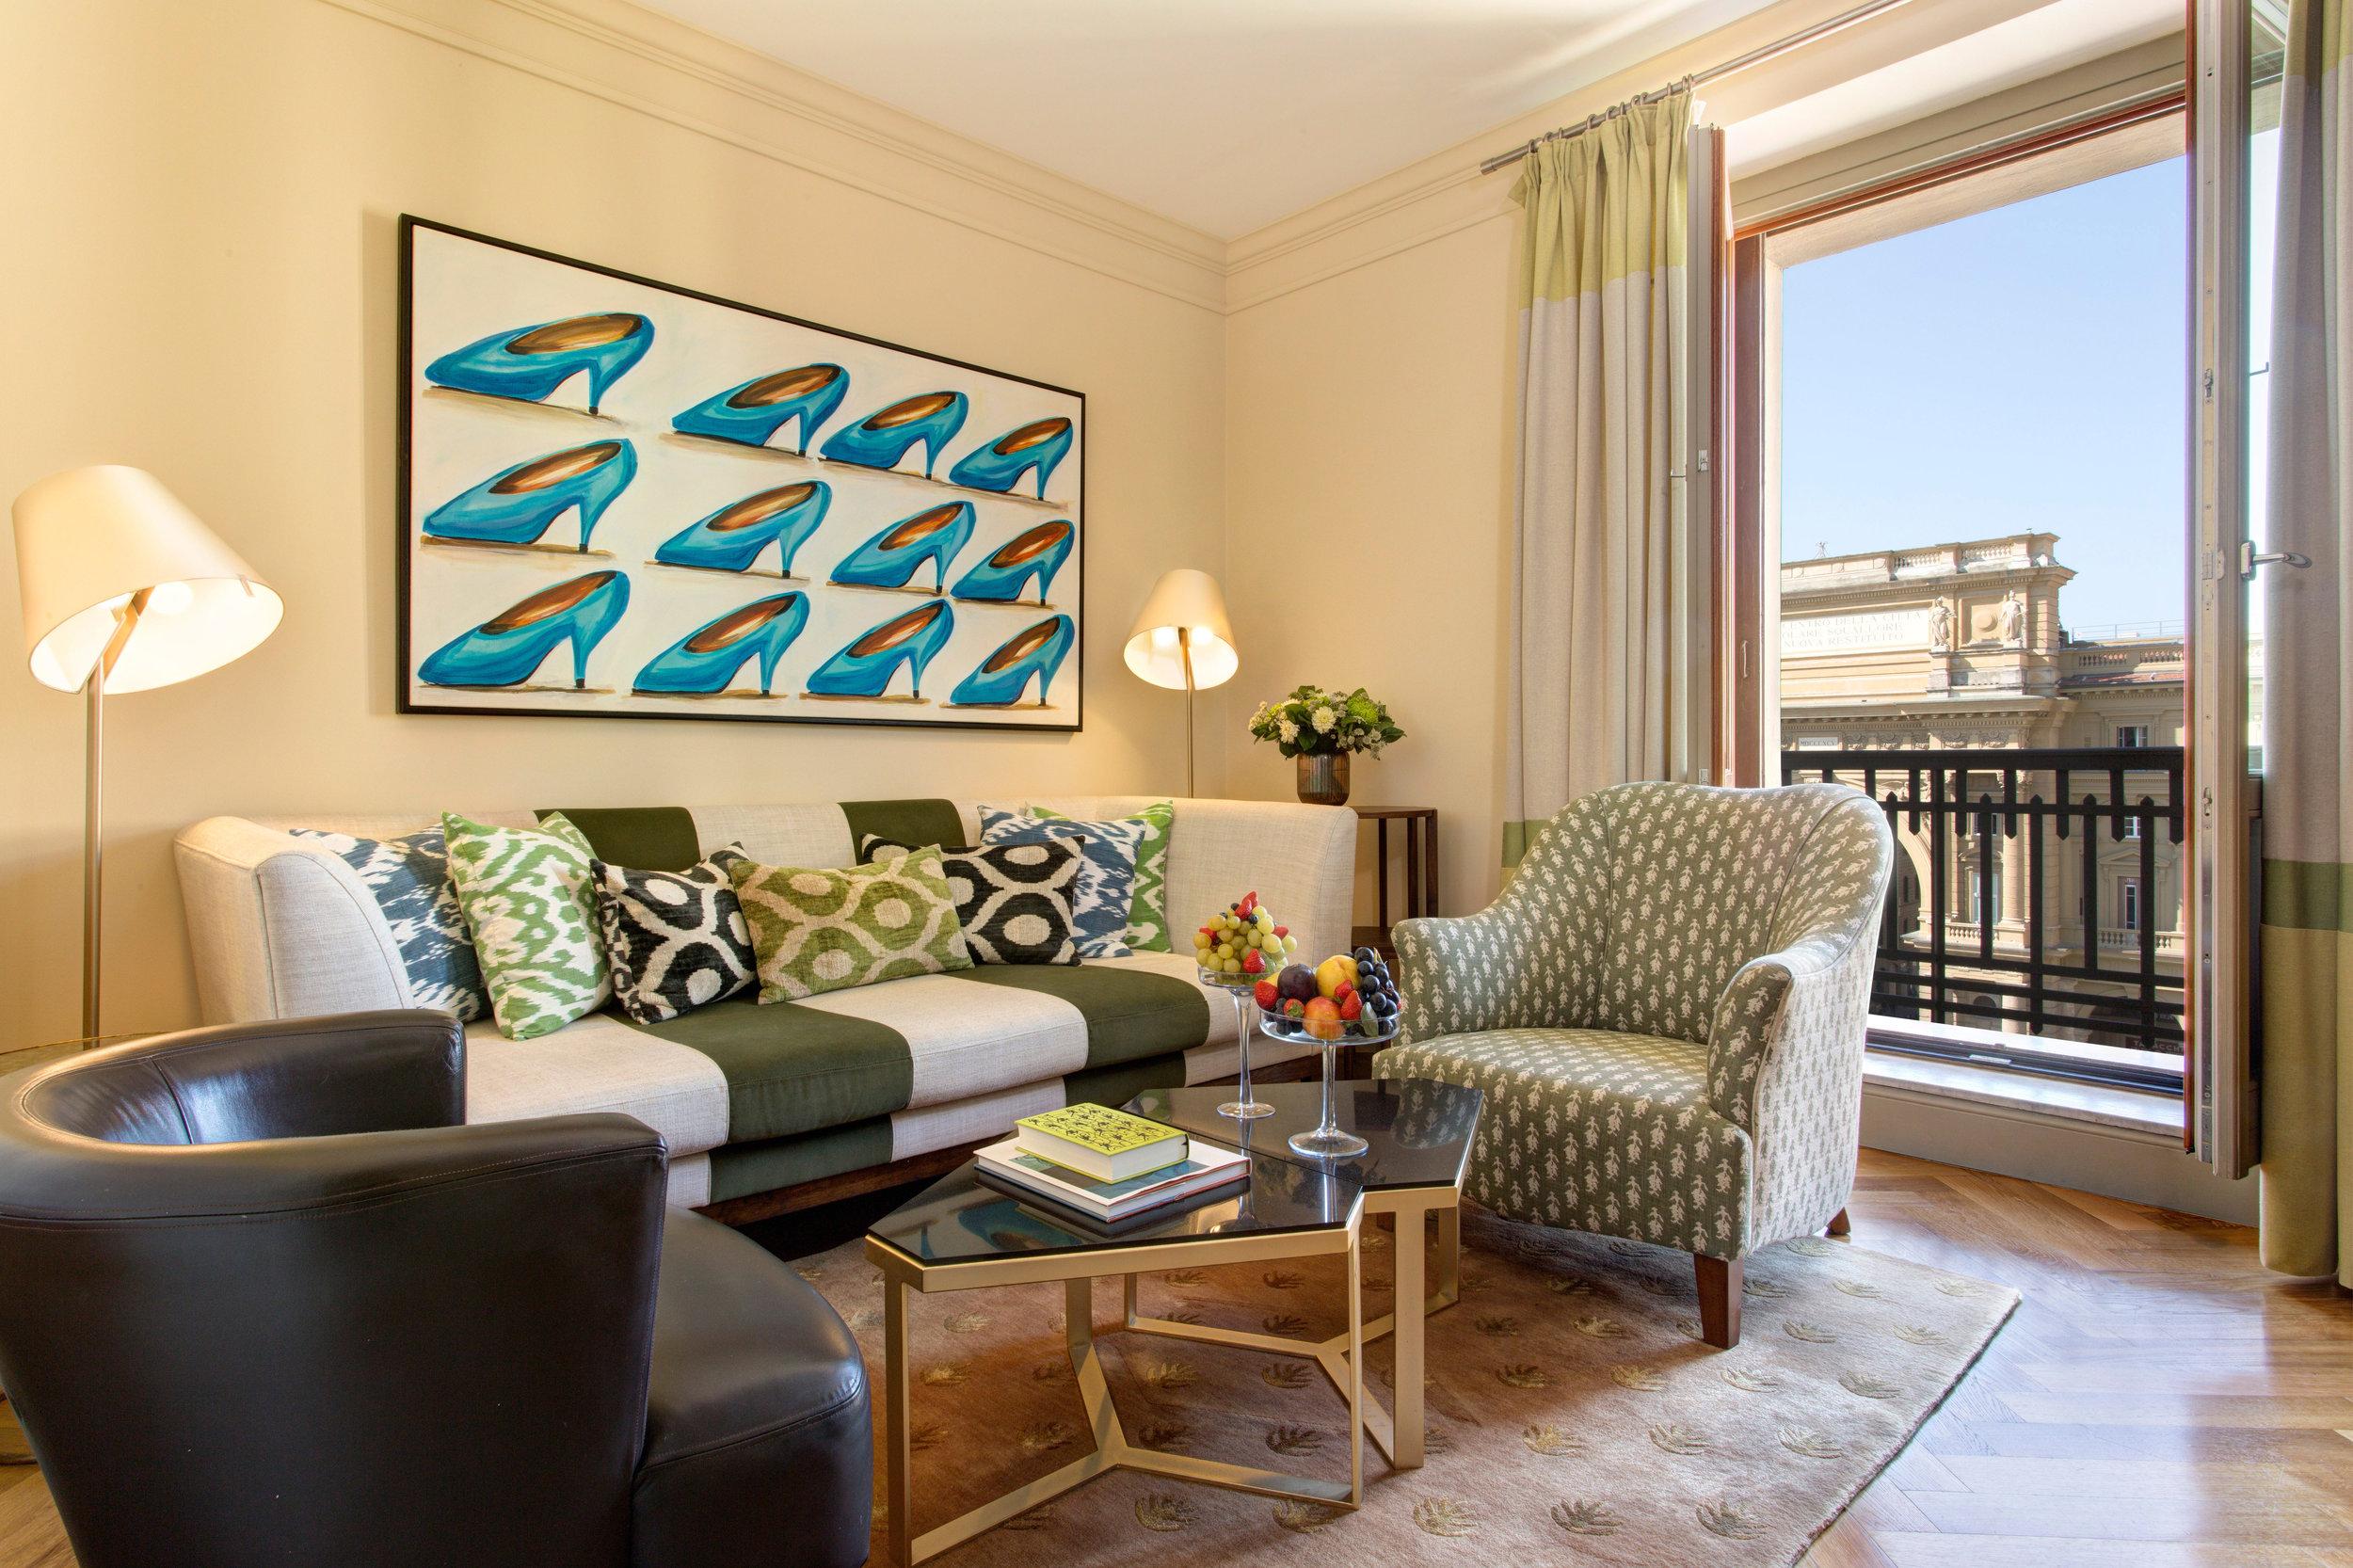 1 RFH Hotel Savoy - Executive Suite 409 3776 JG Oct 16.JPG